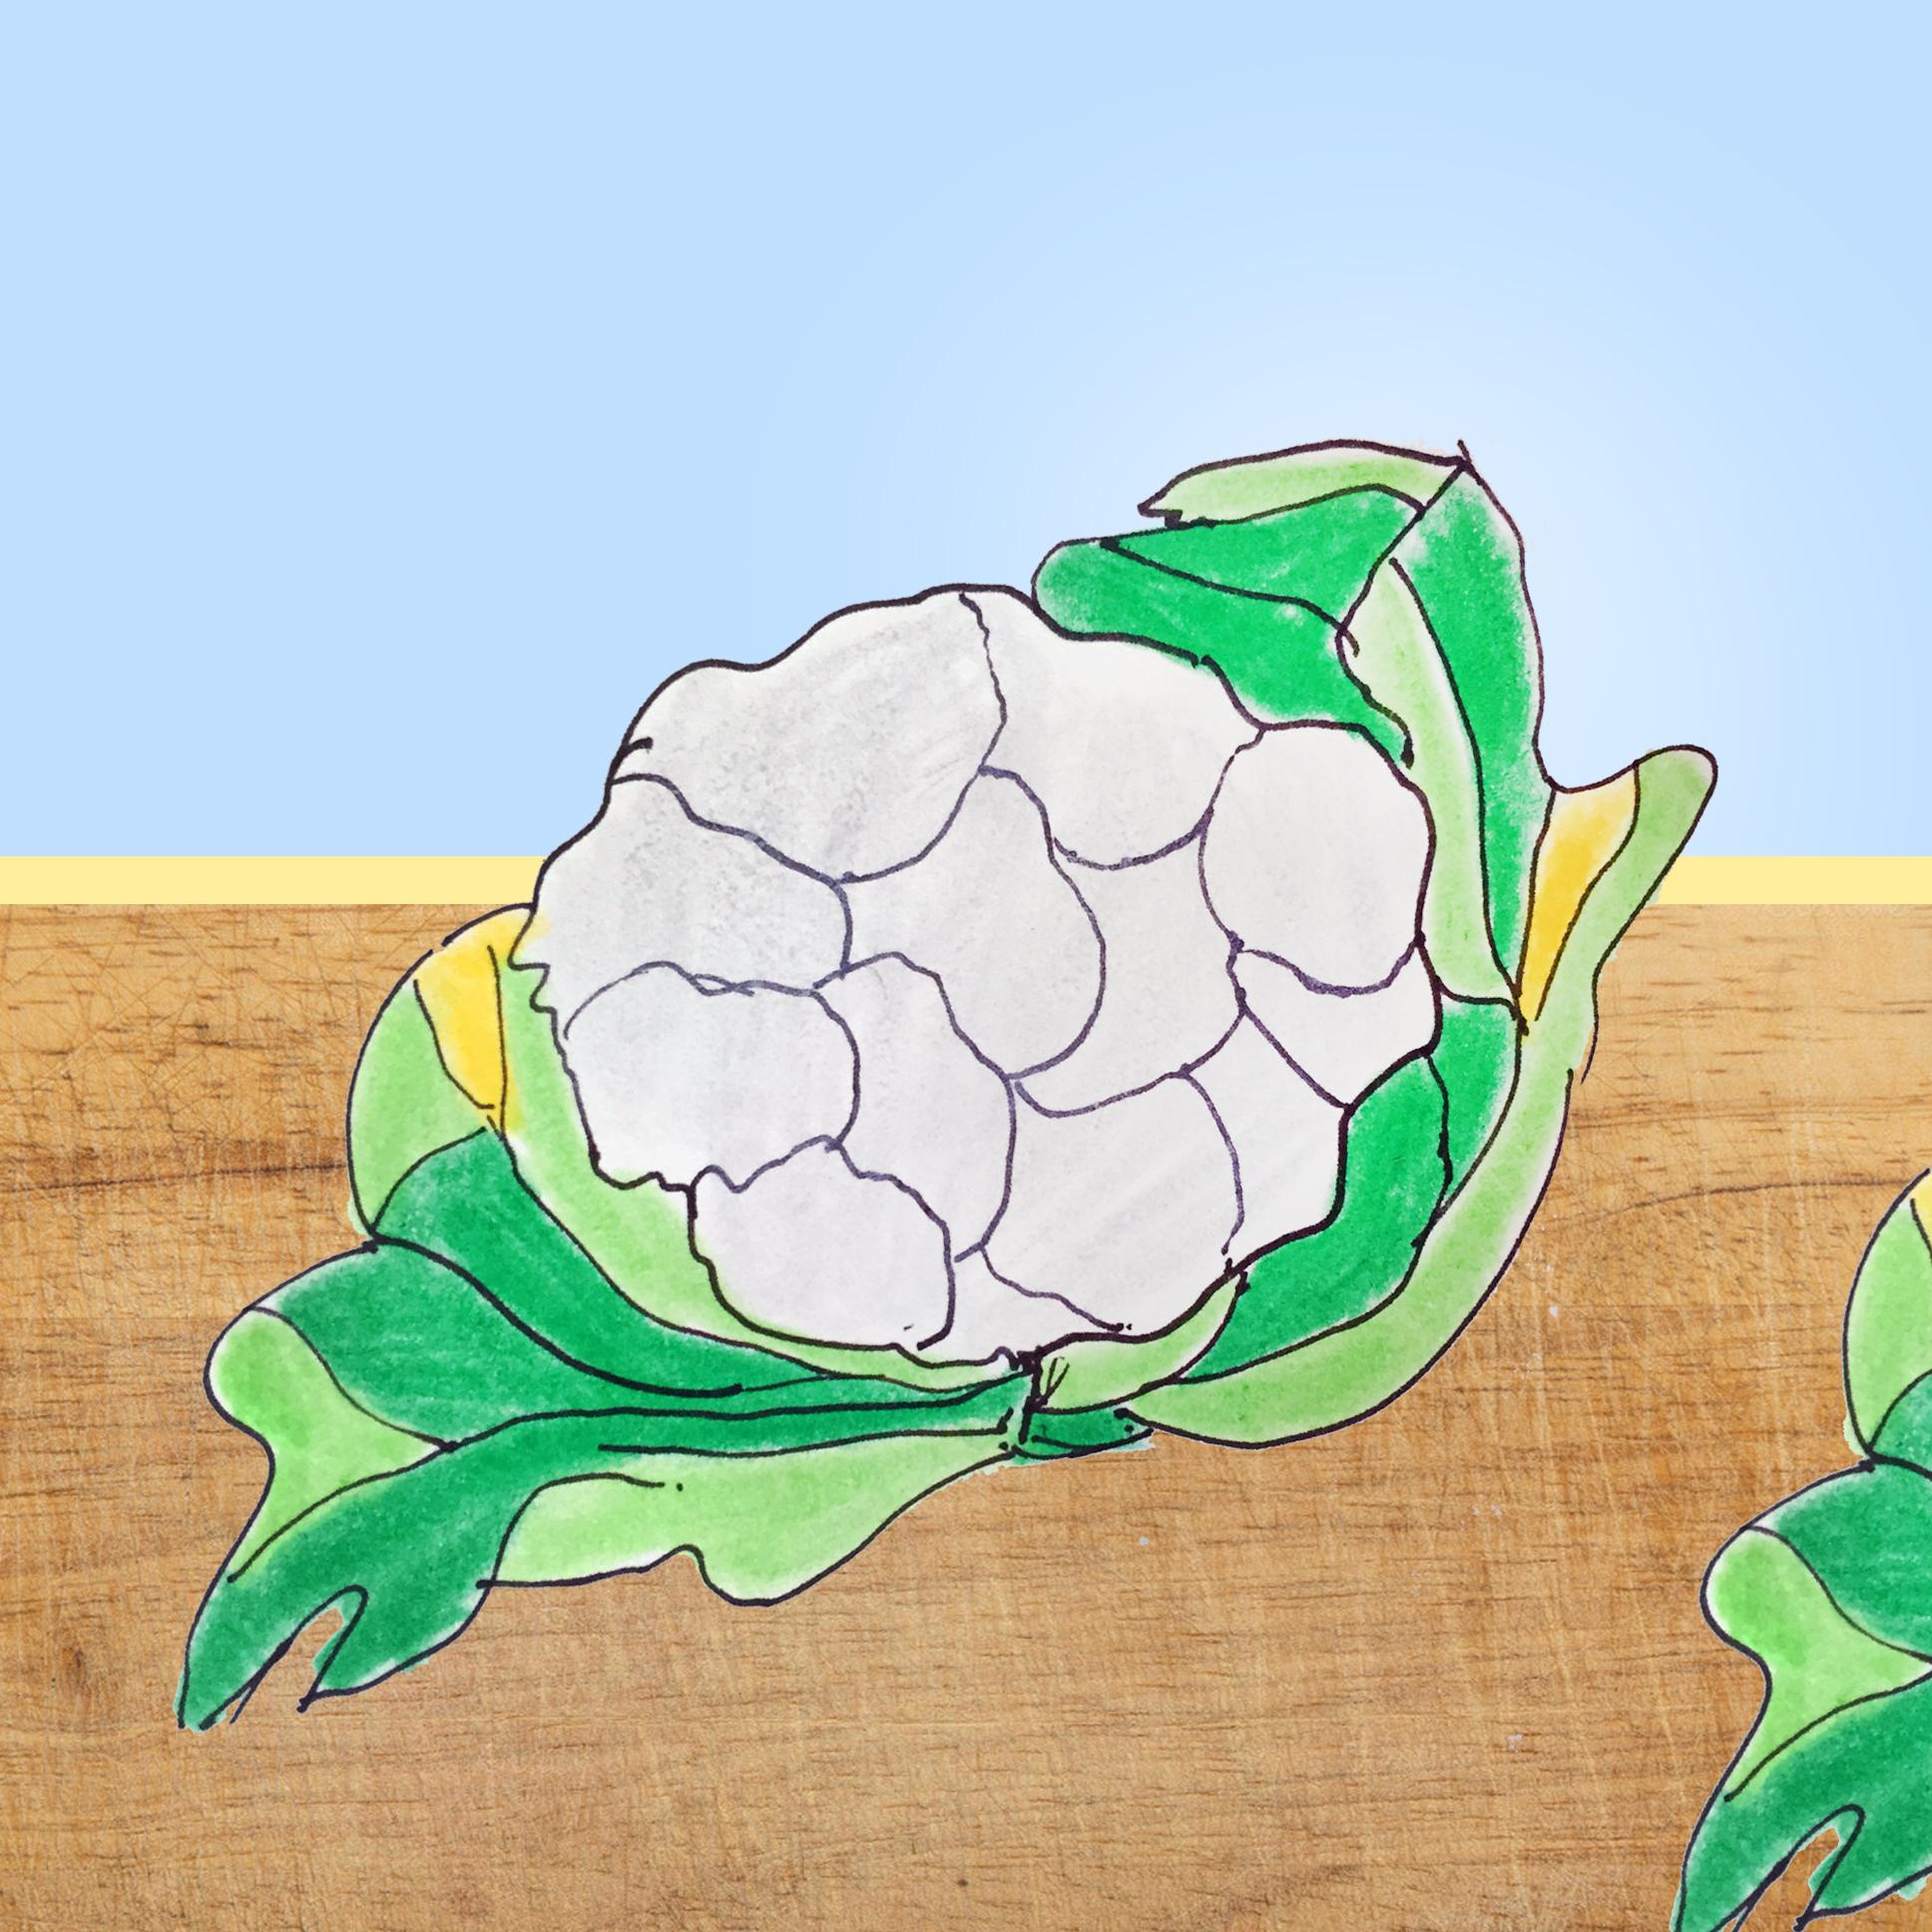 cauliflower_ameliagoss.jpg